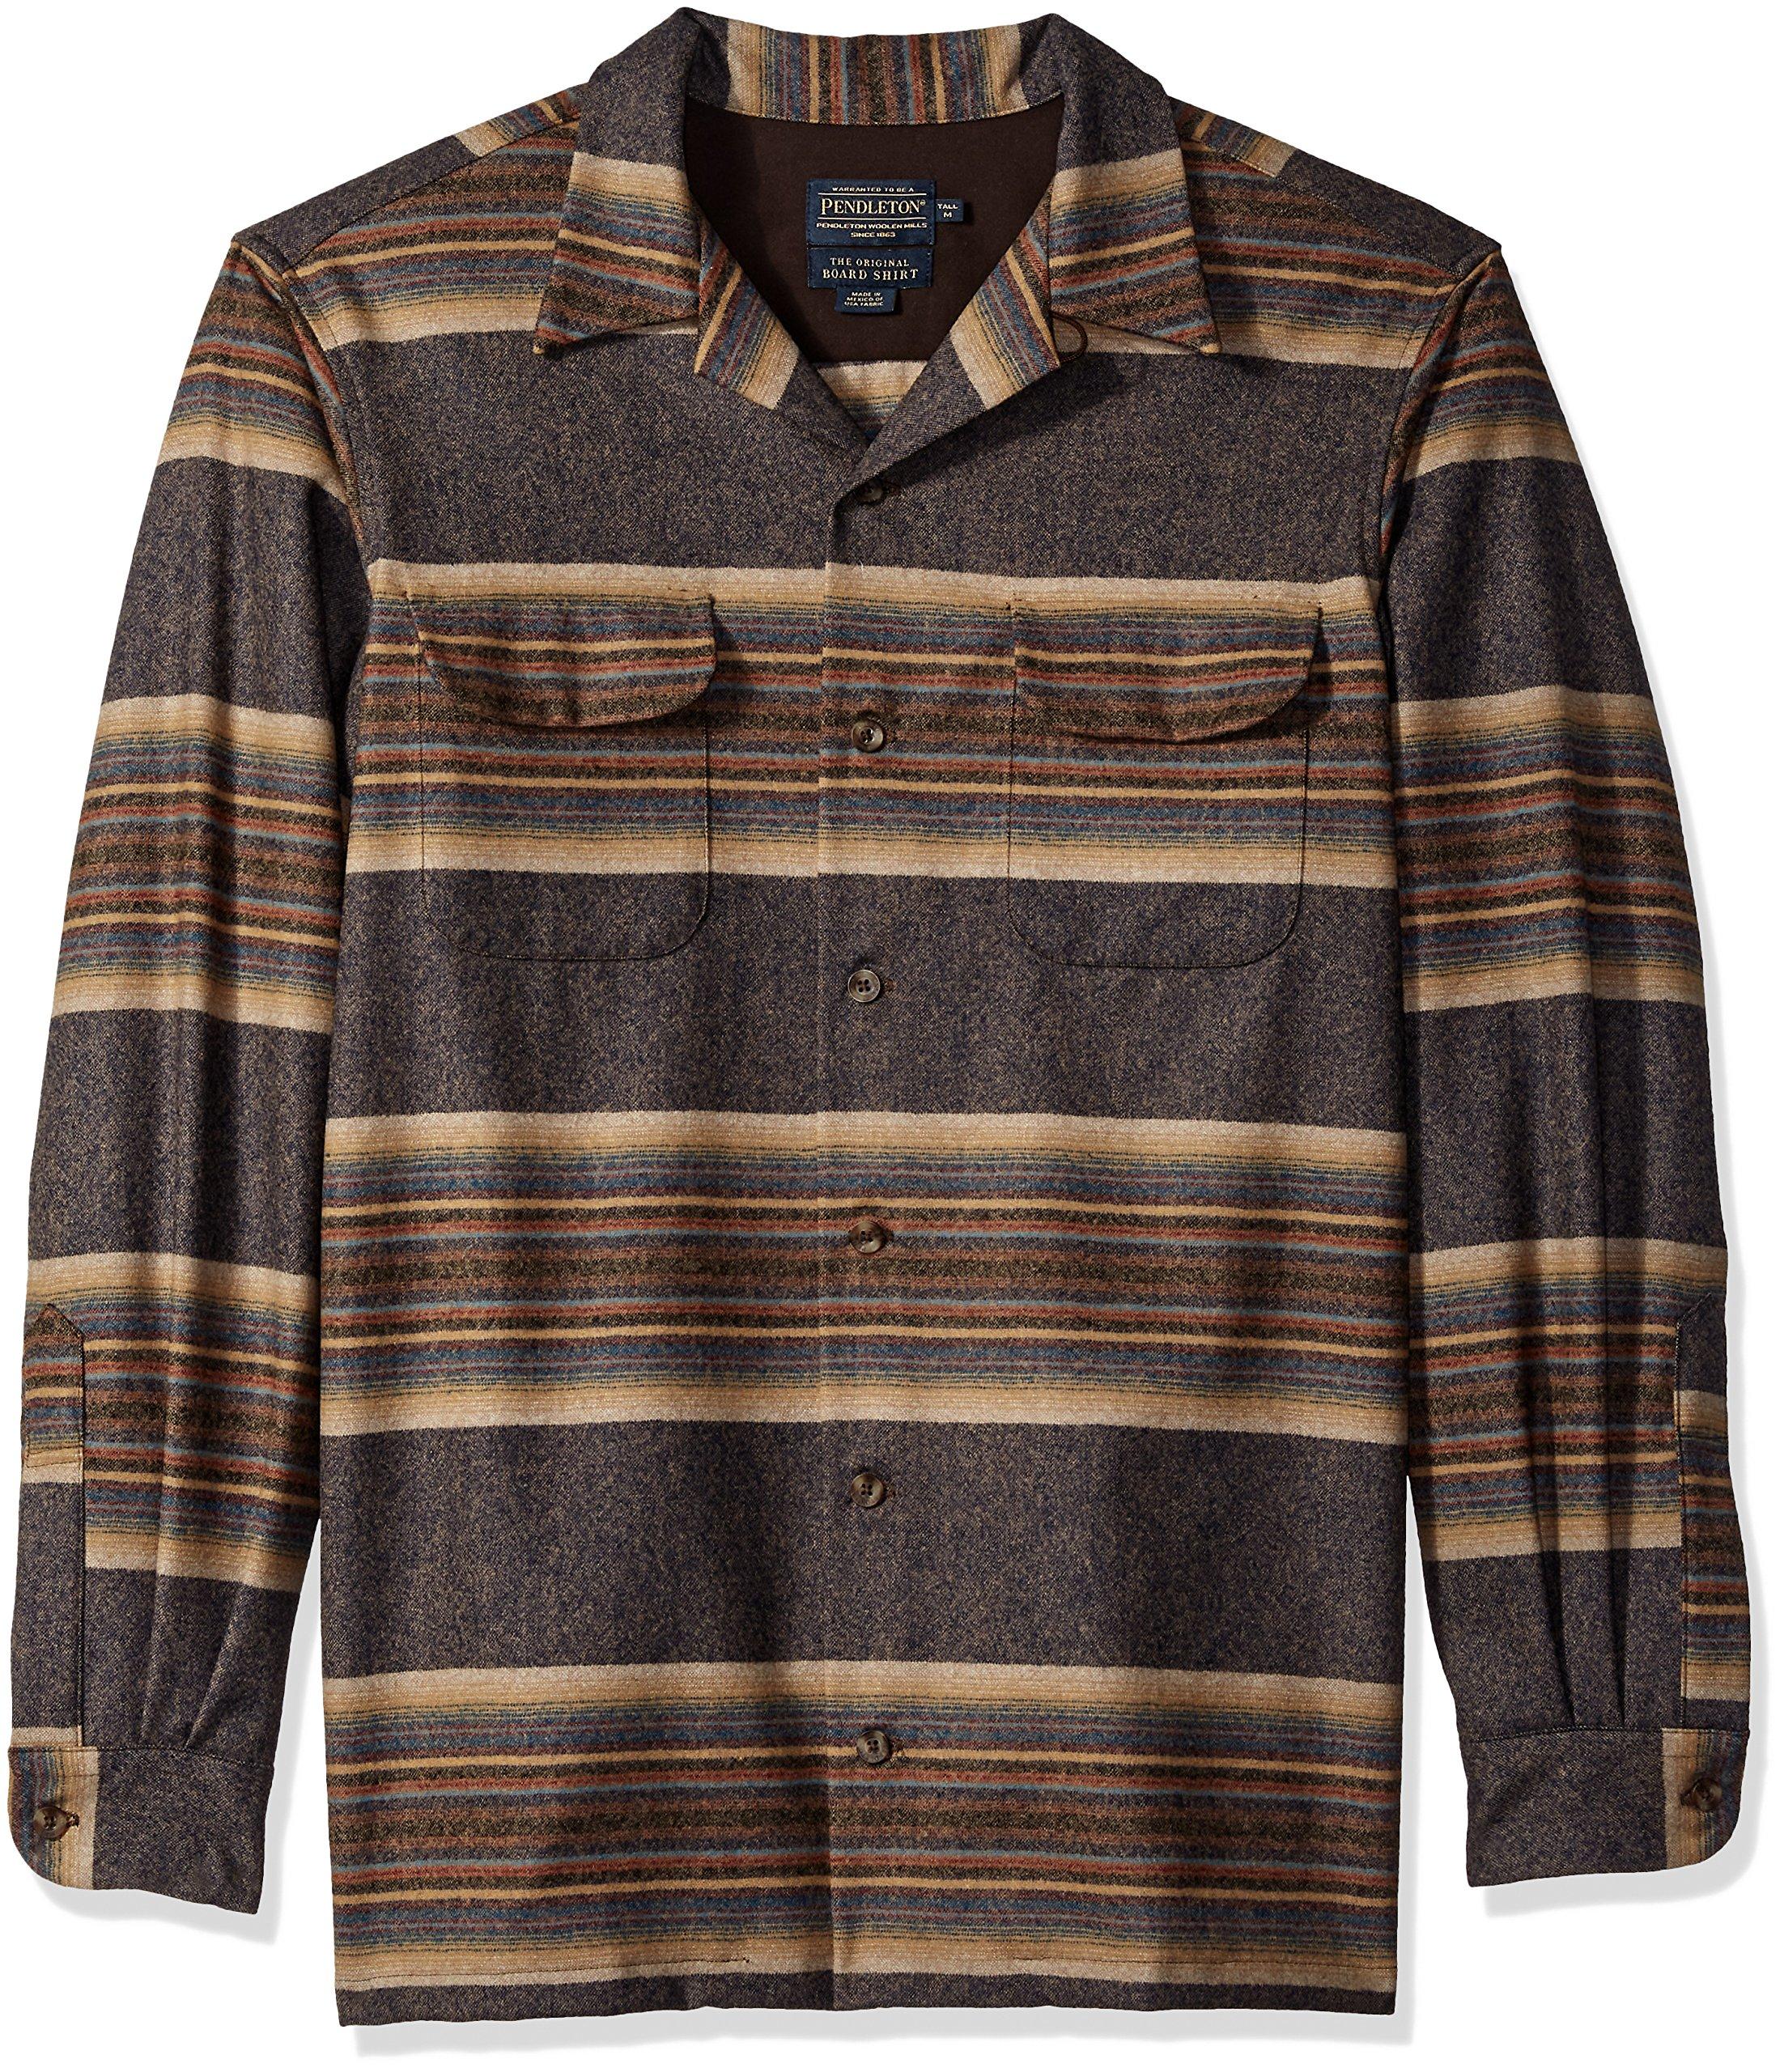 Pendleton Men's Tall Size Big & Tall Long Sleeve Board Shirt, Navy/tan/Blue Stripe XL